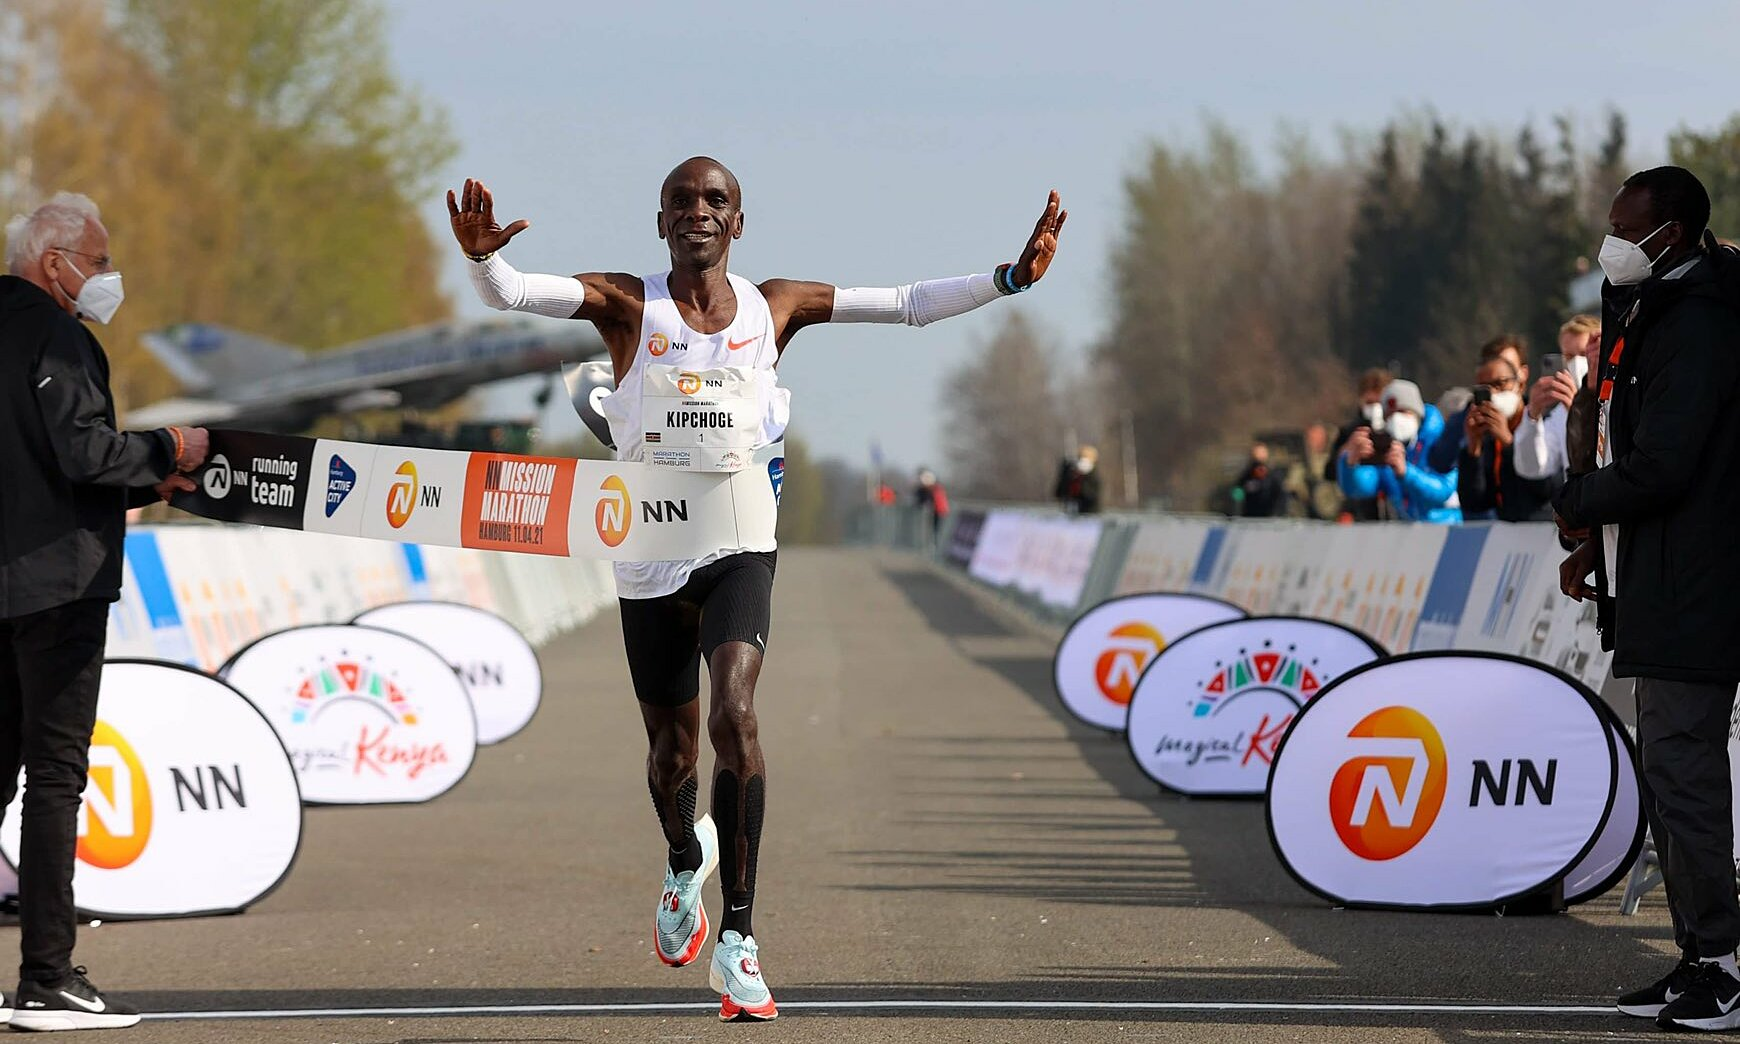 Kipchoge về nhất tại NN Mission Marathon. Ảnh: NN Running Team